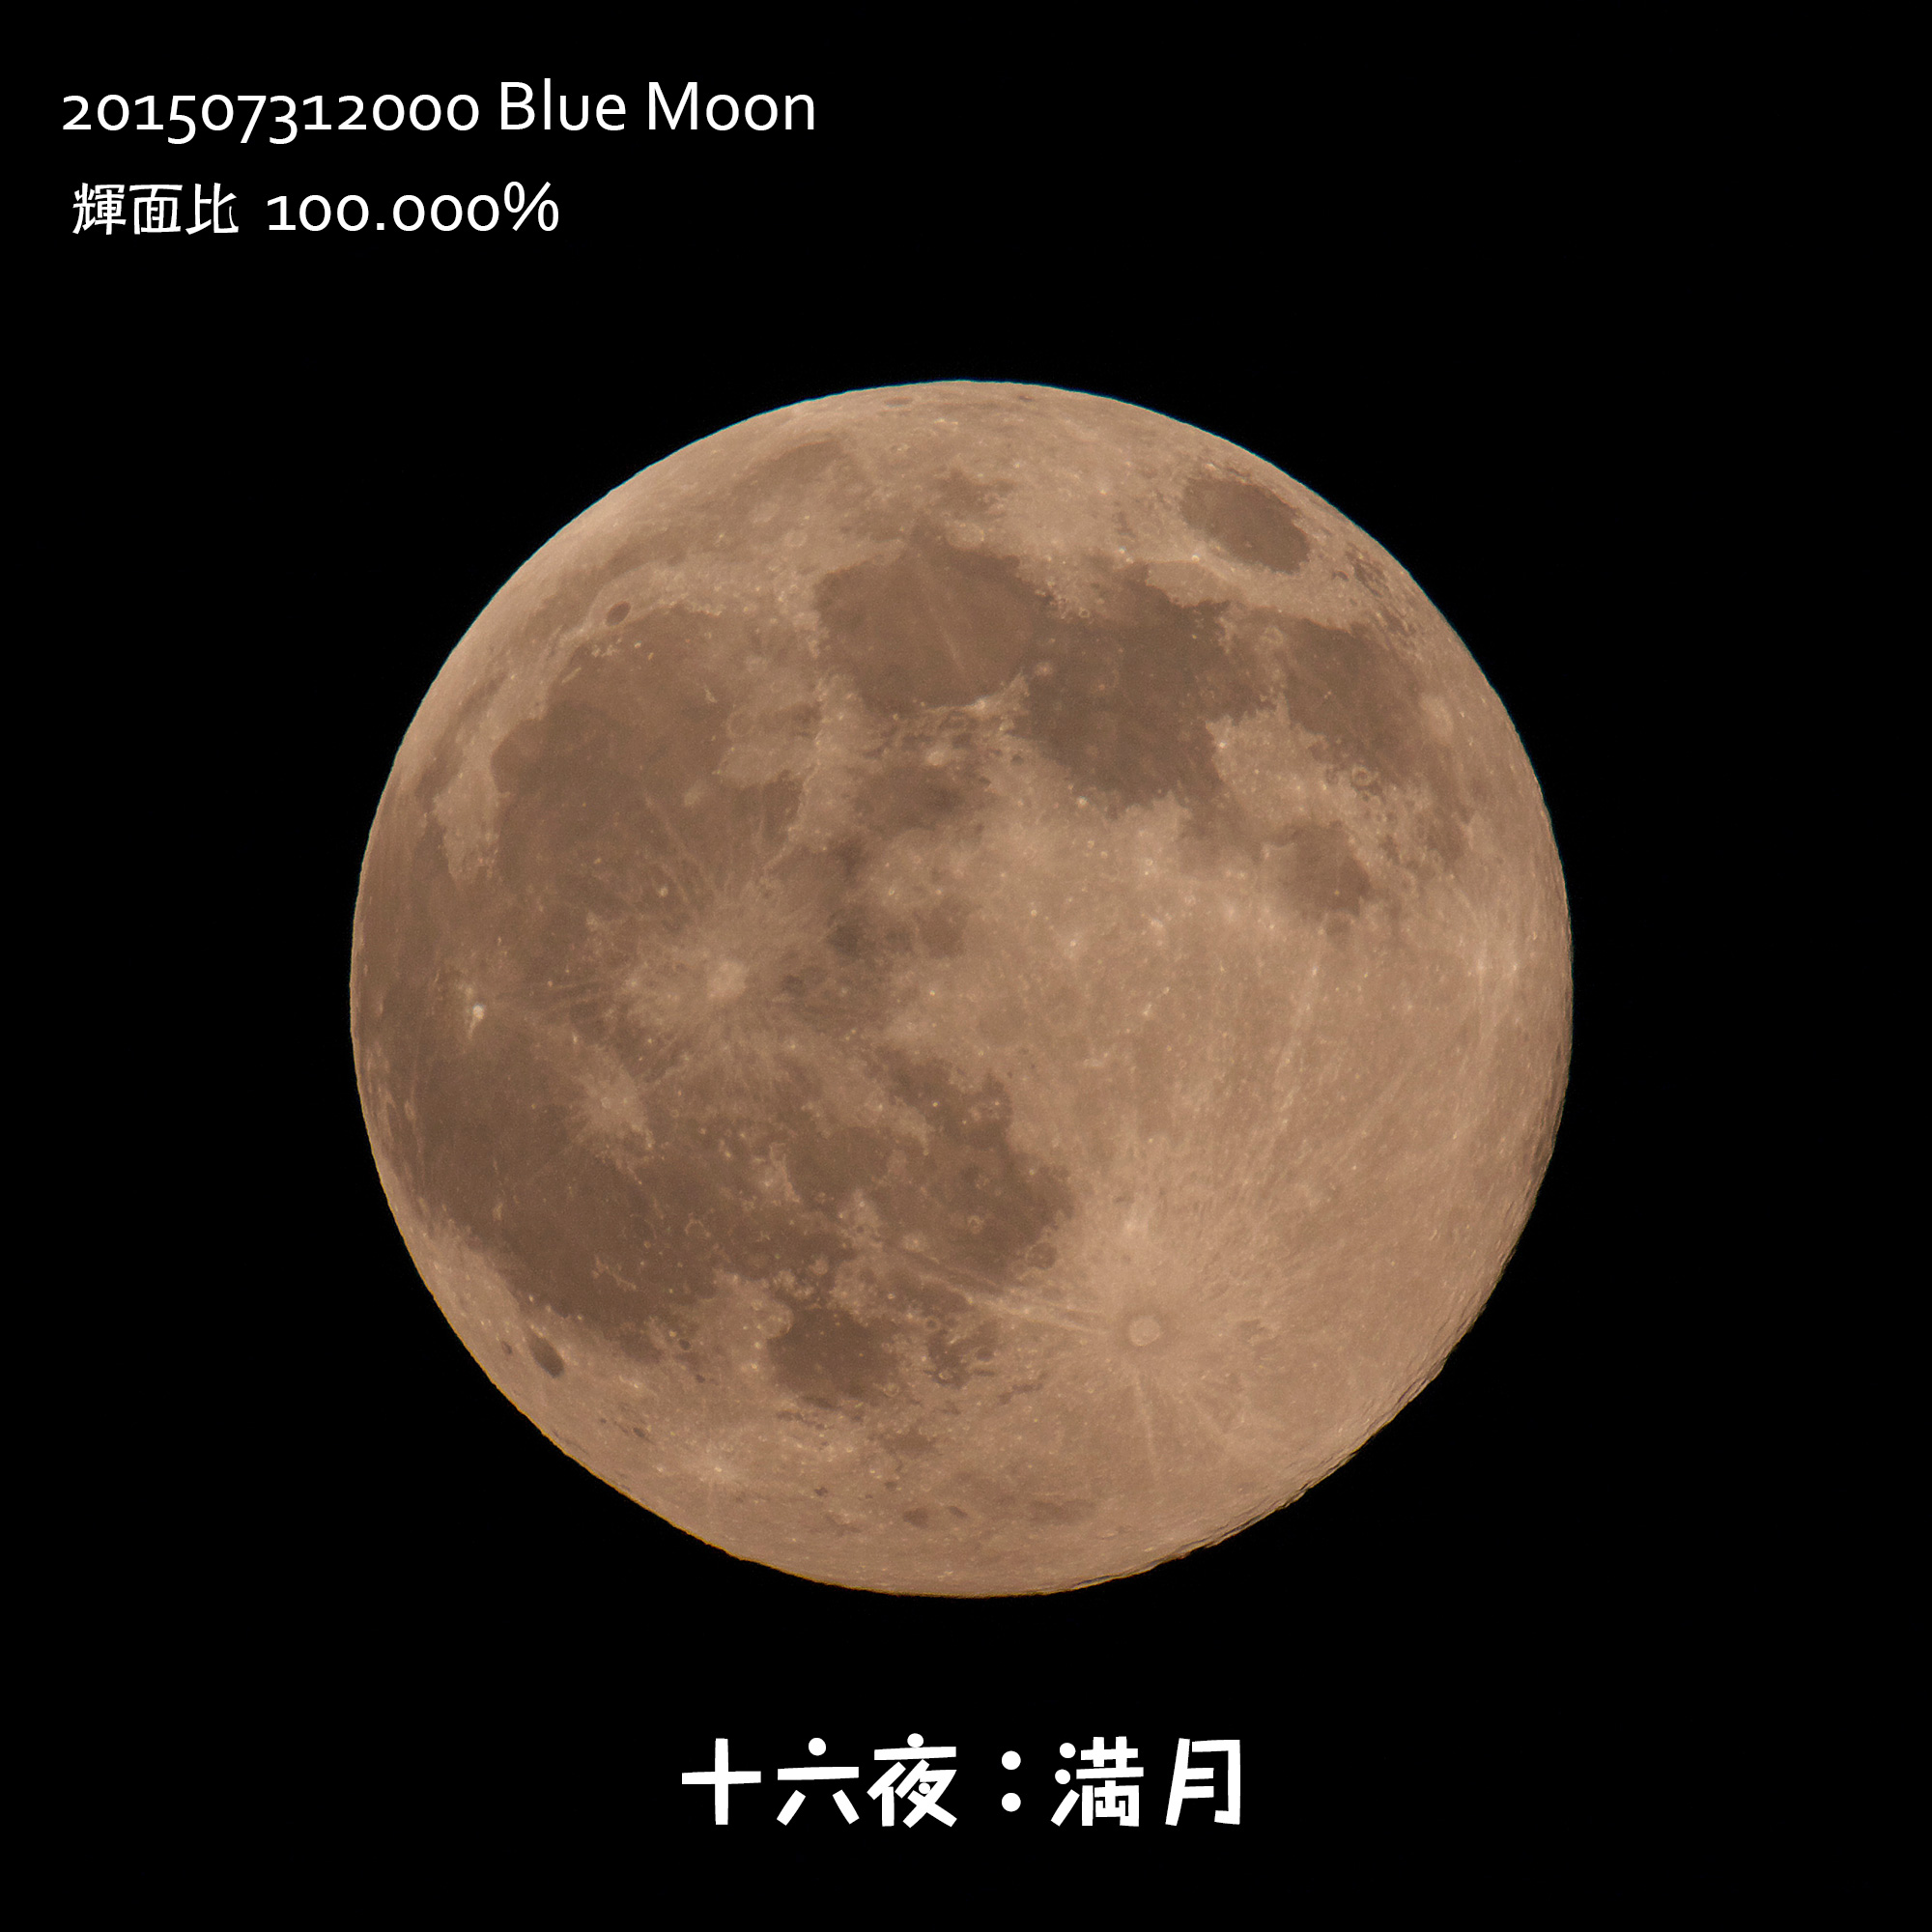 1507312000_blue_moon